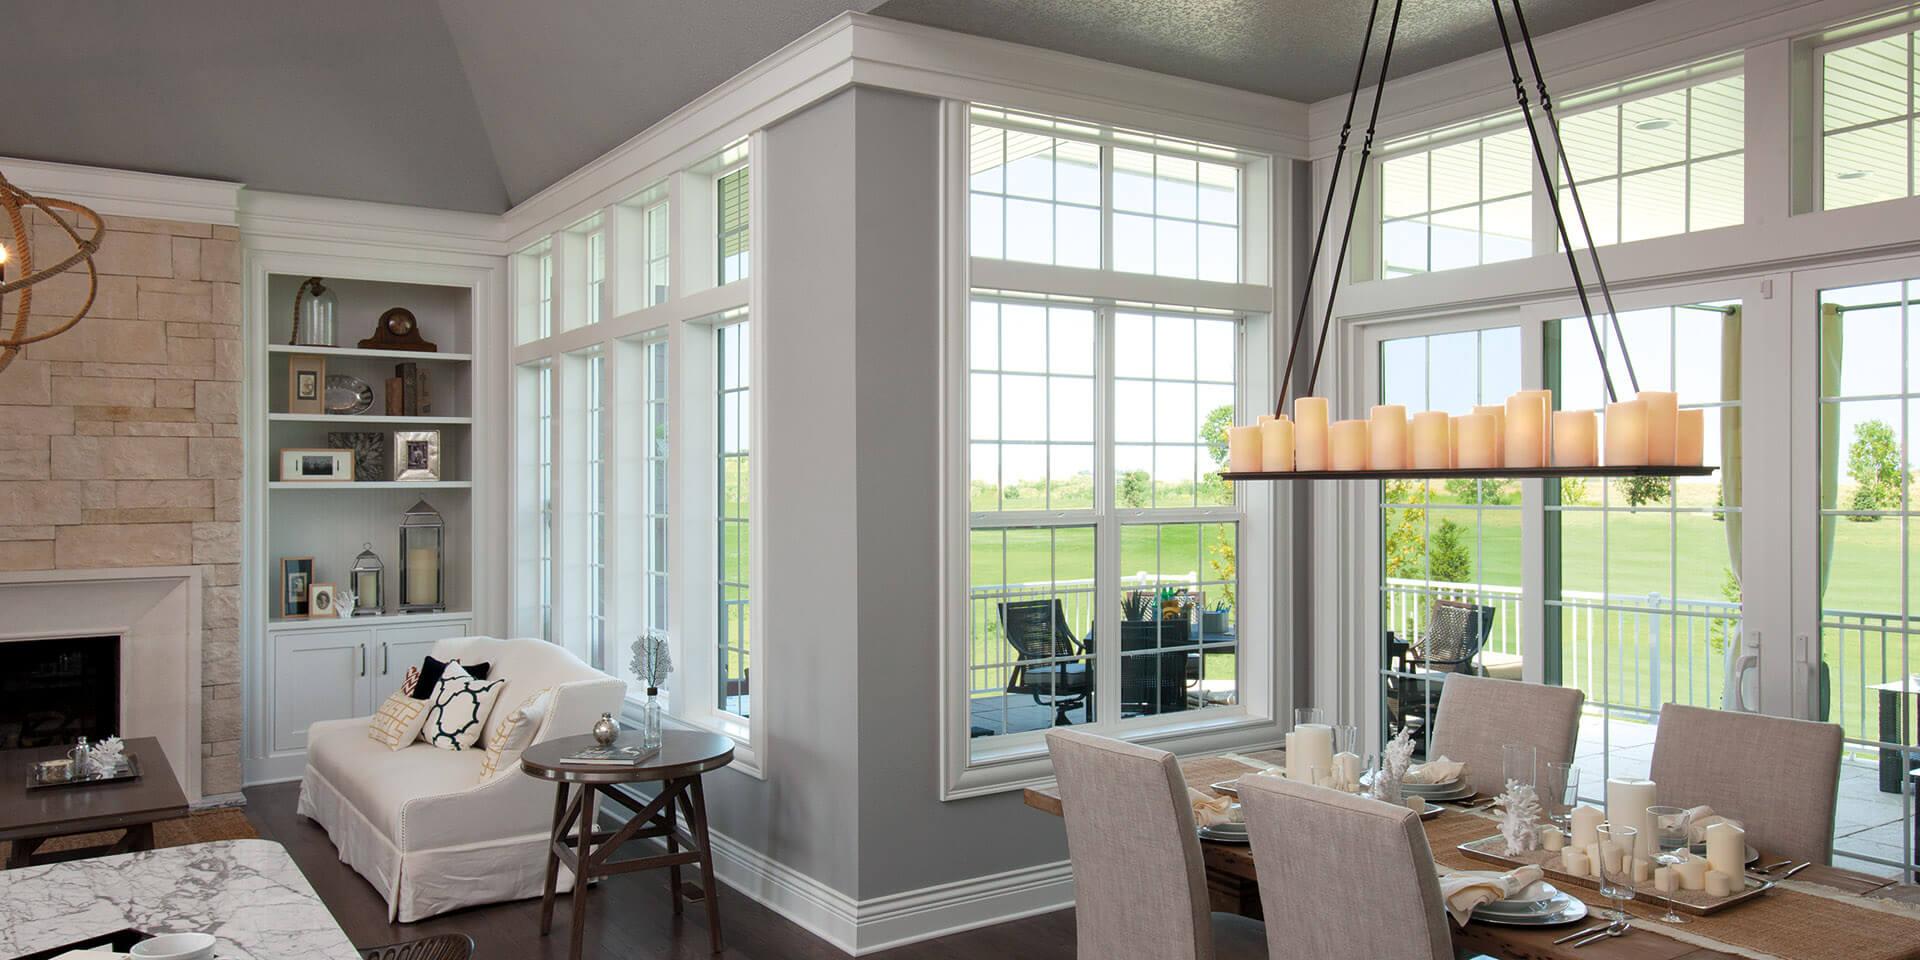 Deluxe Windows Roofing Siding Morganville Nj